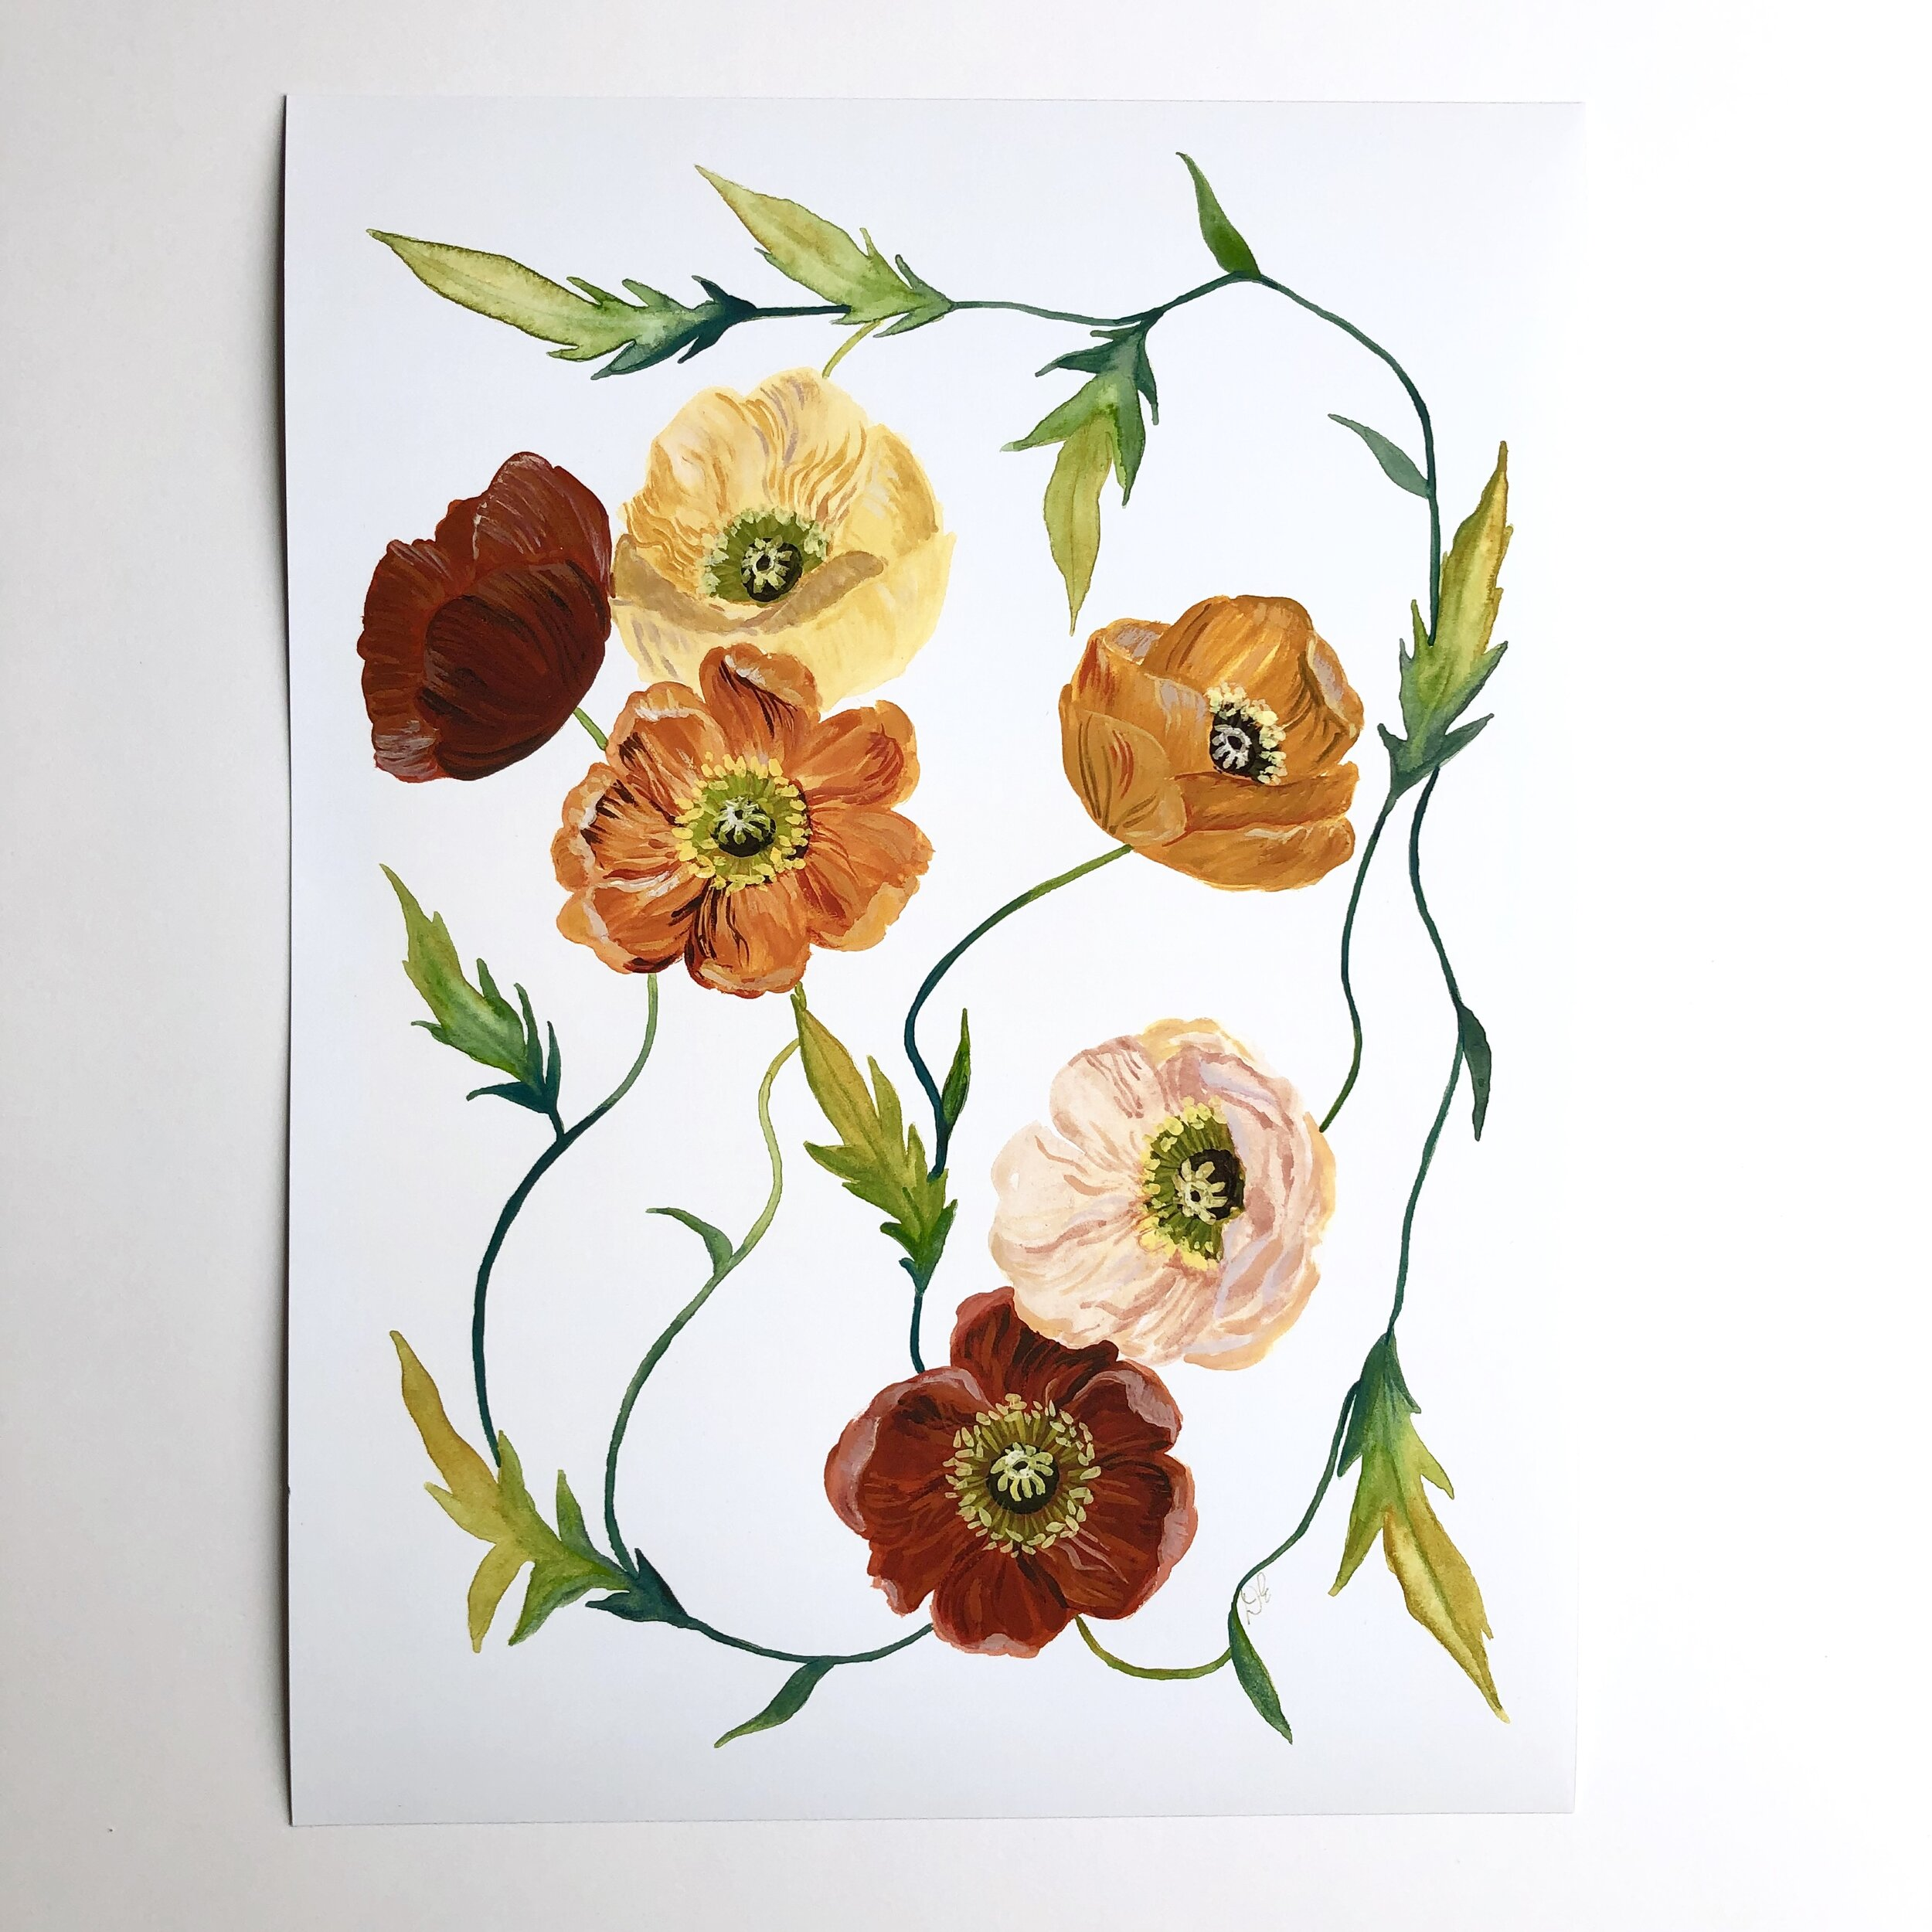 Dana Rose Artwork + Design   Green Bay, WI